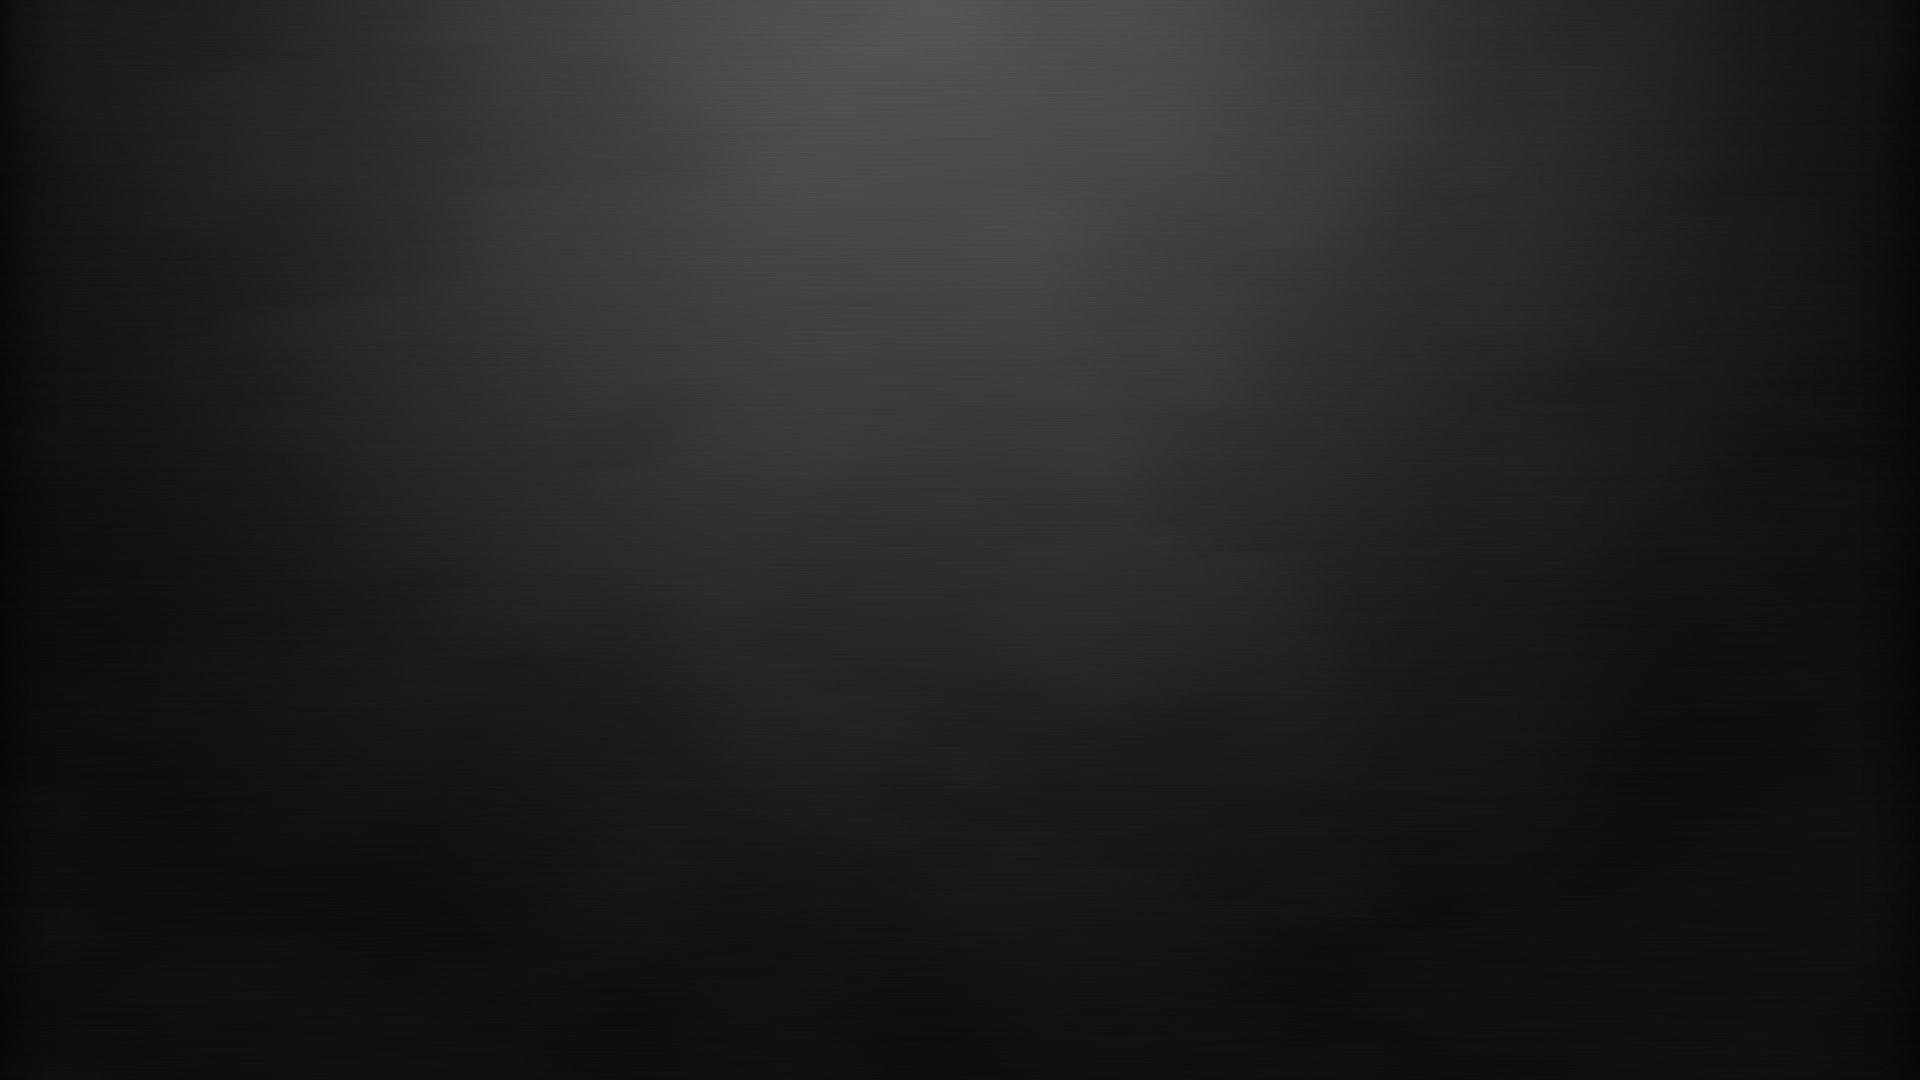 blackboard background download free stunning high resolution